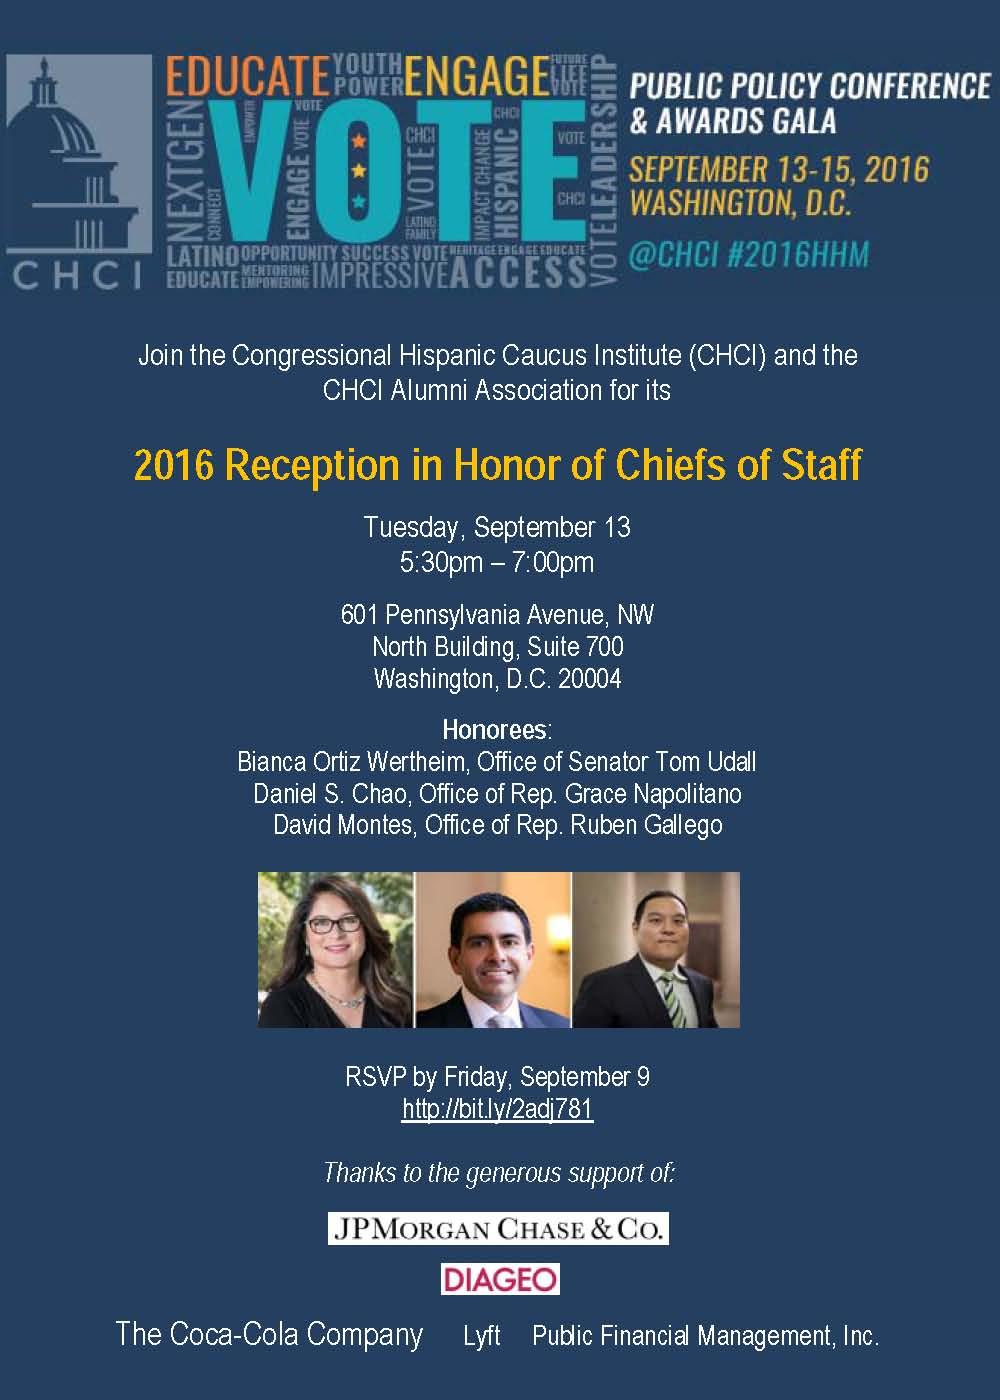 CHCI-AA Chiefs of Staff Reception Invite